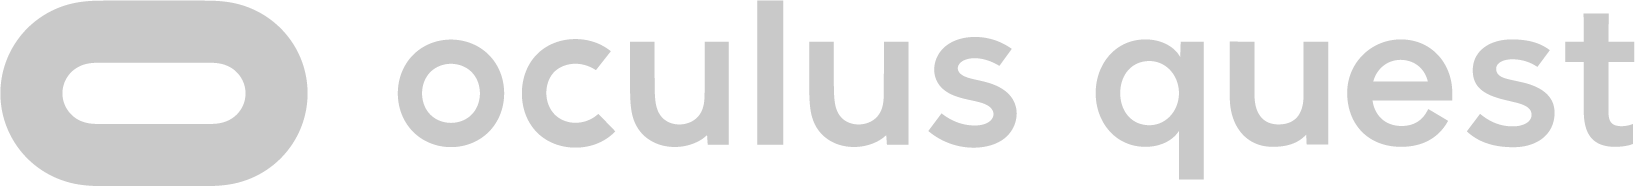 oculusquest-grey